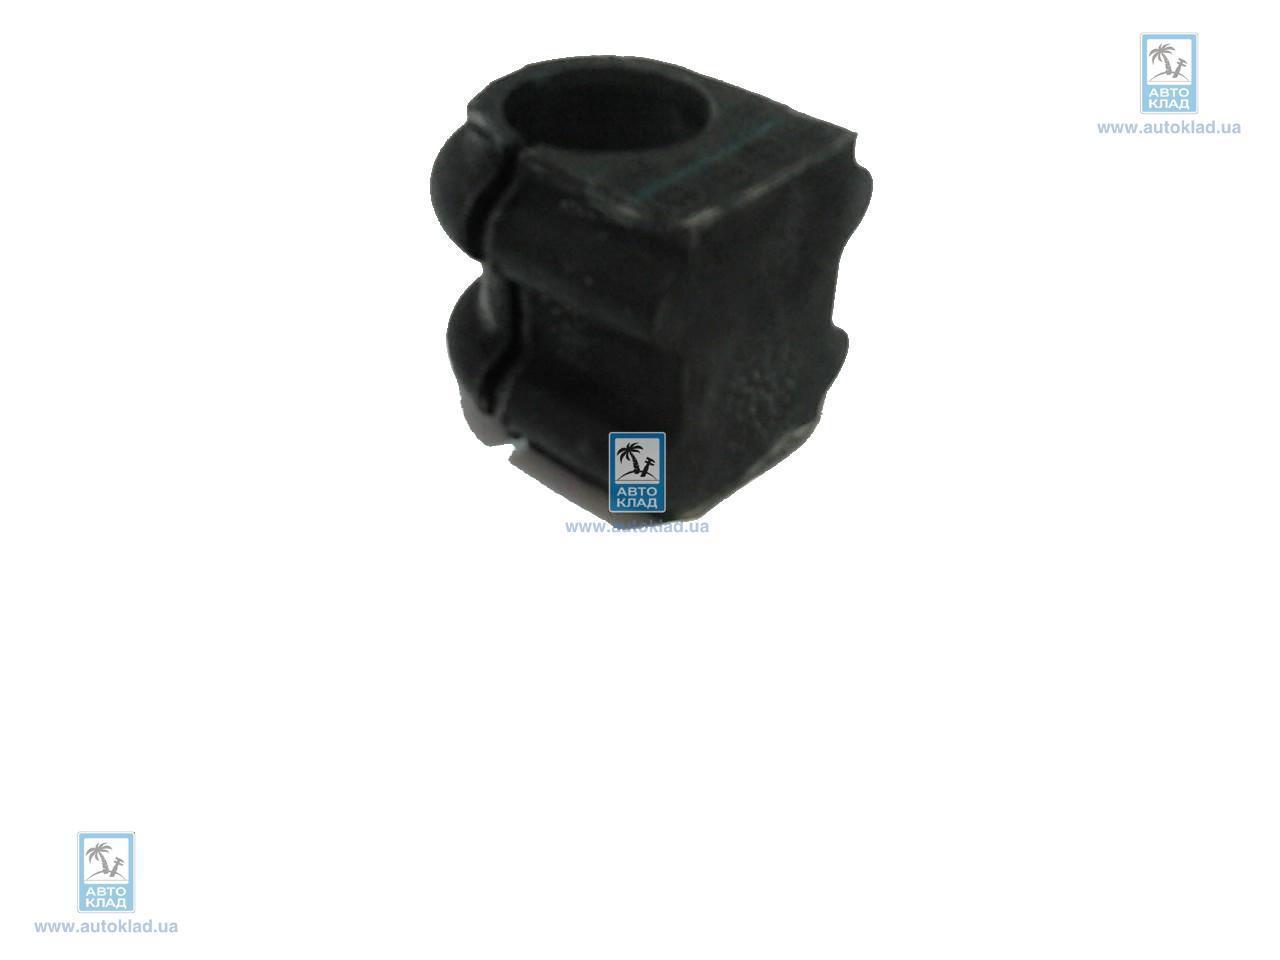 Втулка стабилизатора HYUNDAI/KIA 54812-1G100